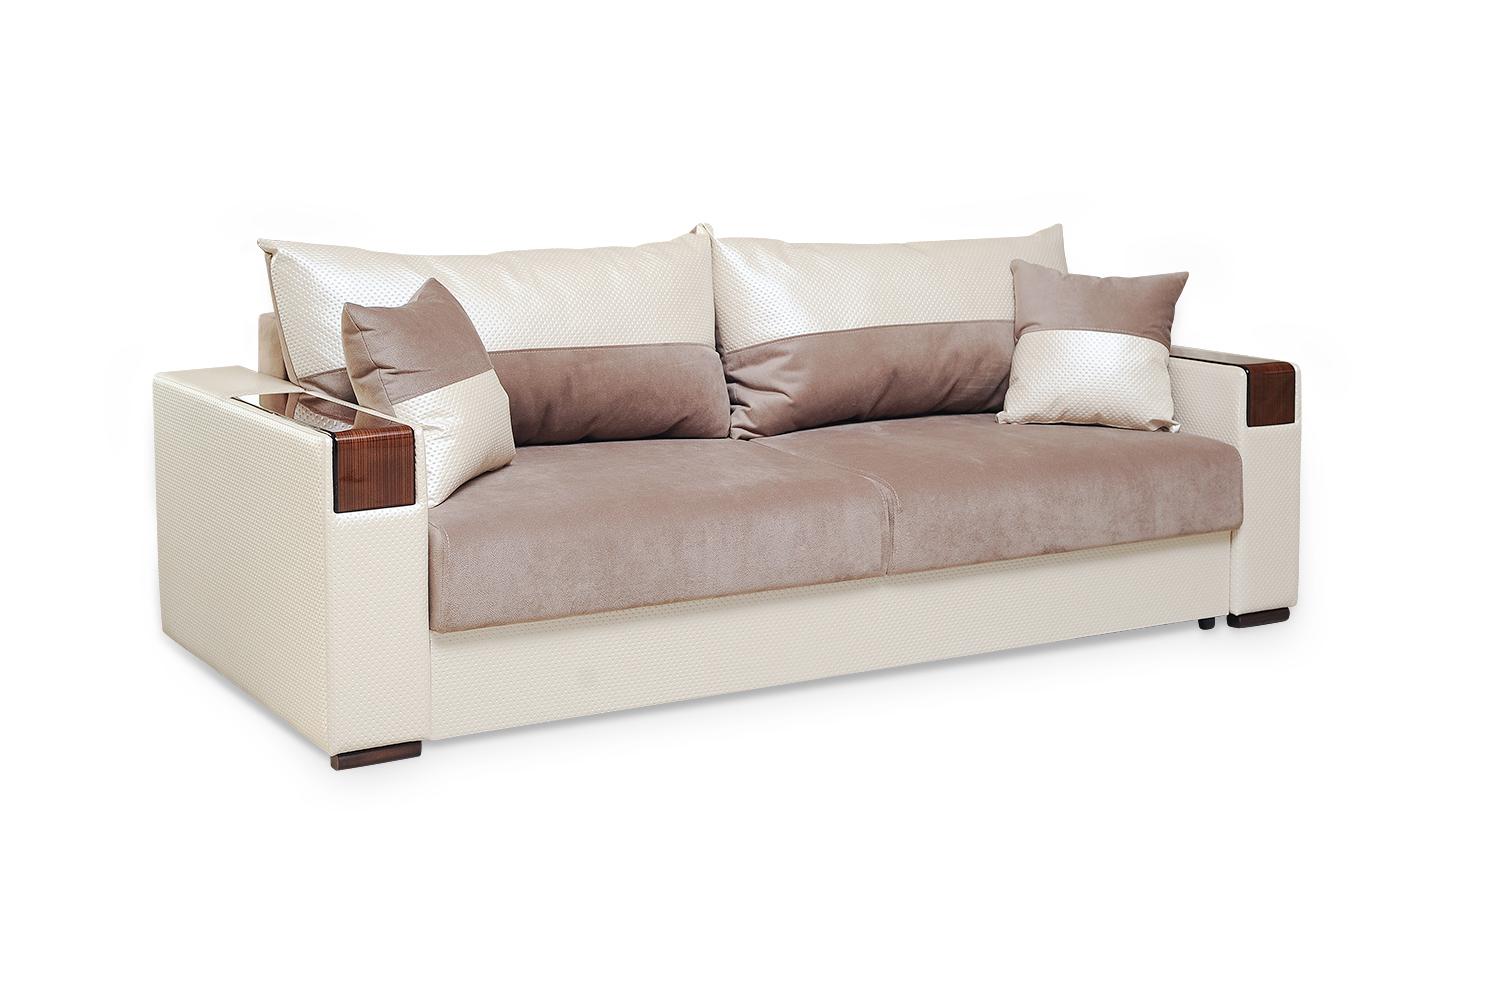 Коралл 8 диван 3-х местный.1